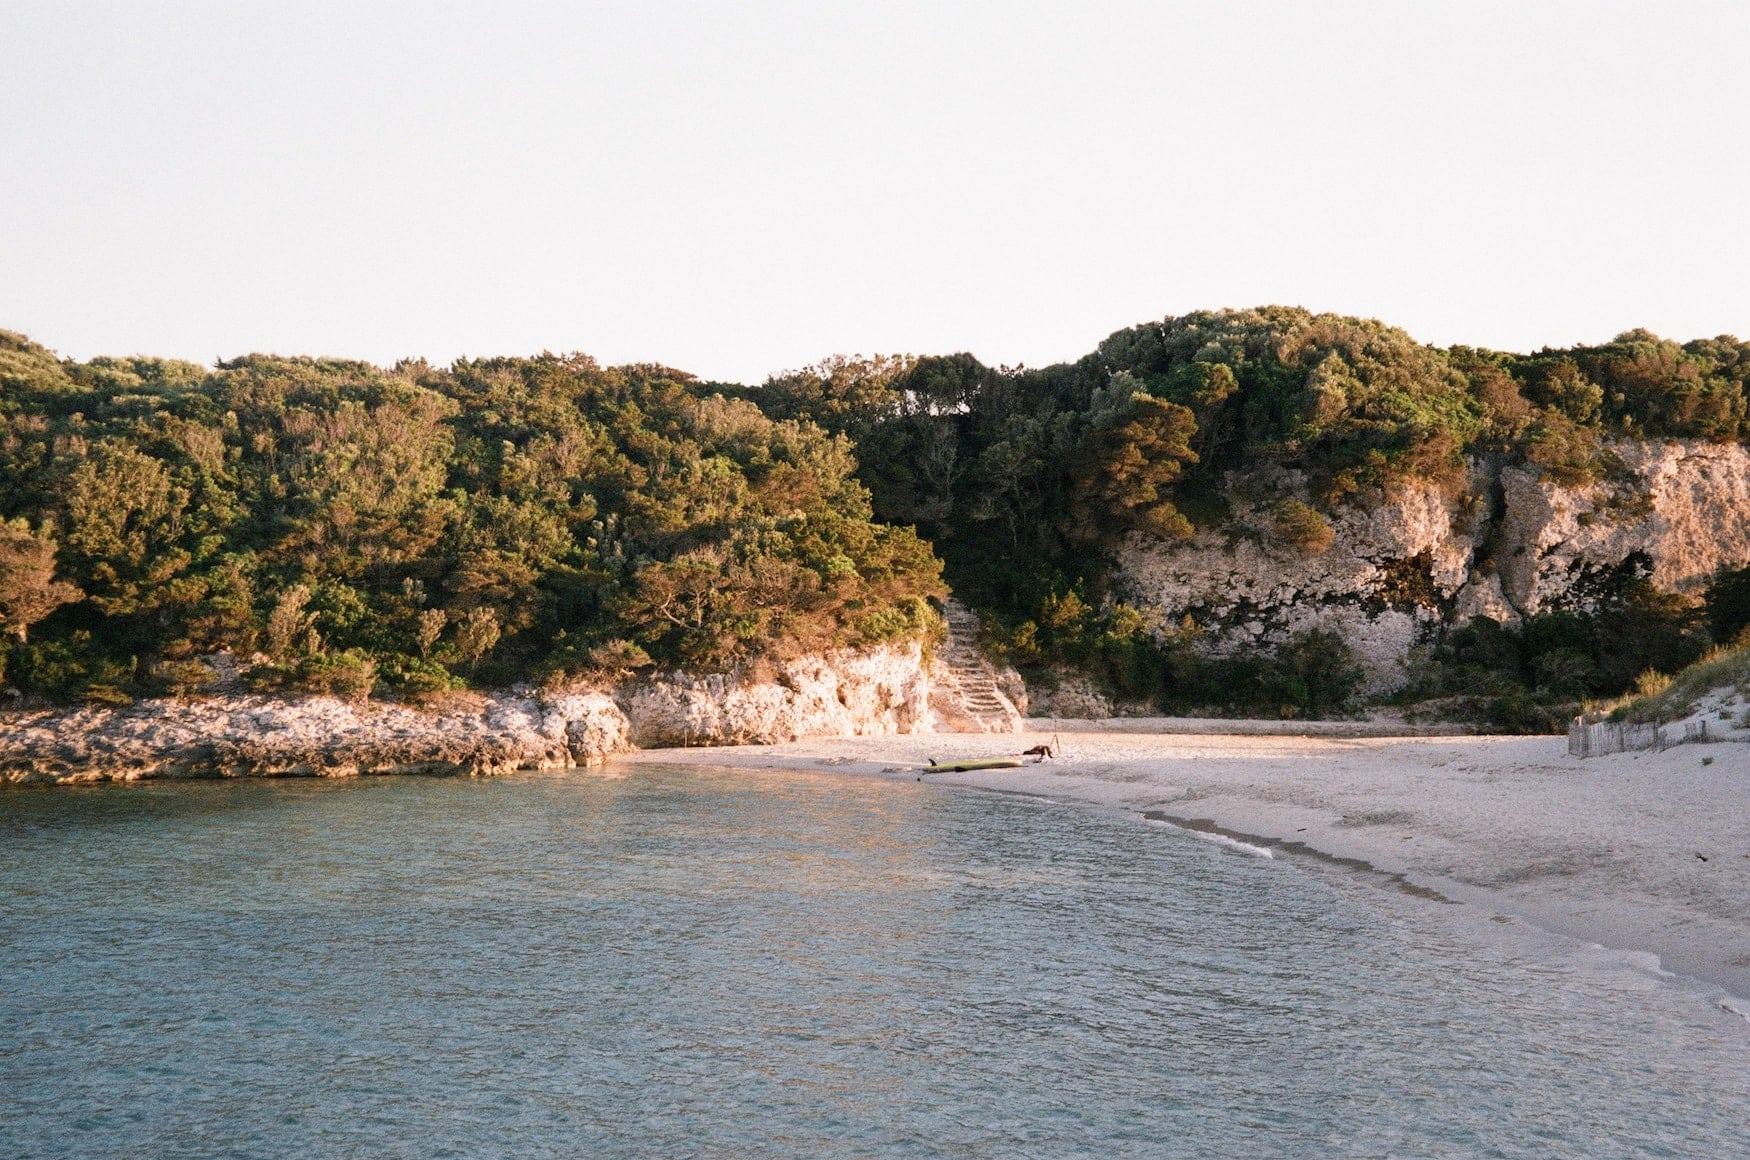 Einsamer Strandabschnitt auf Korsika